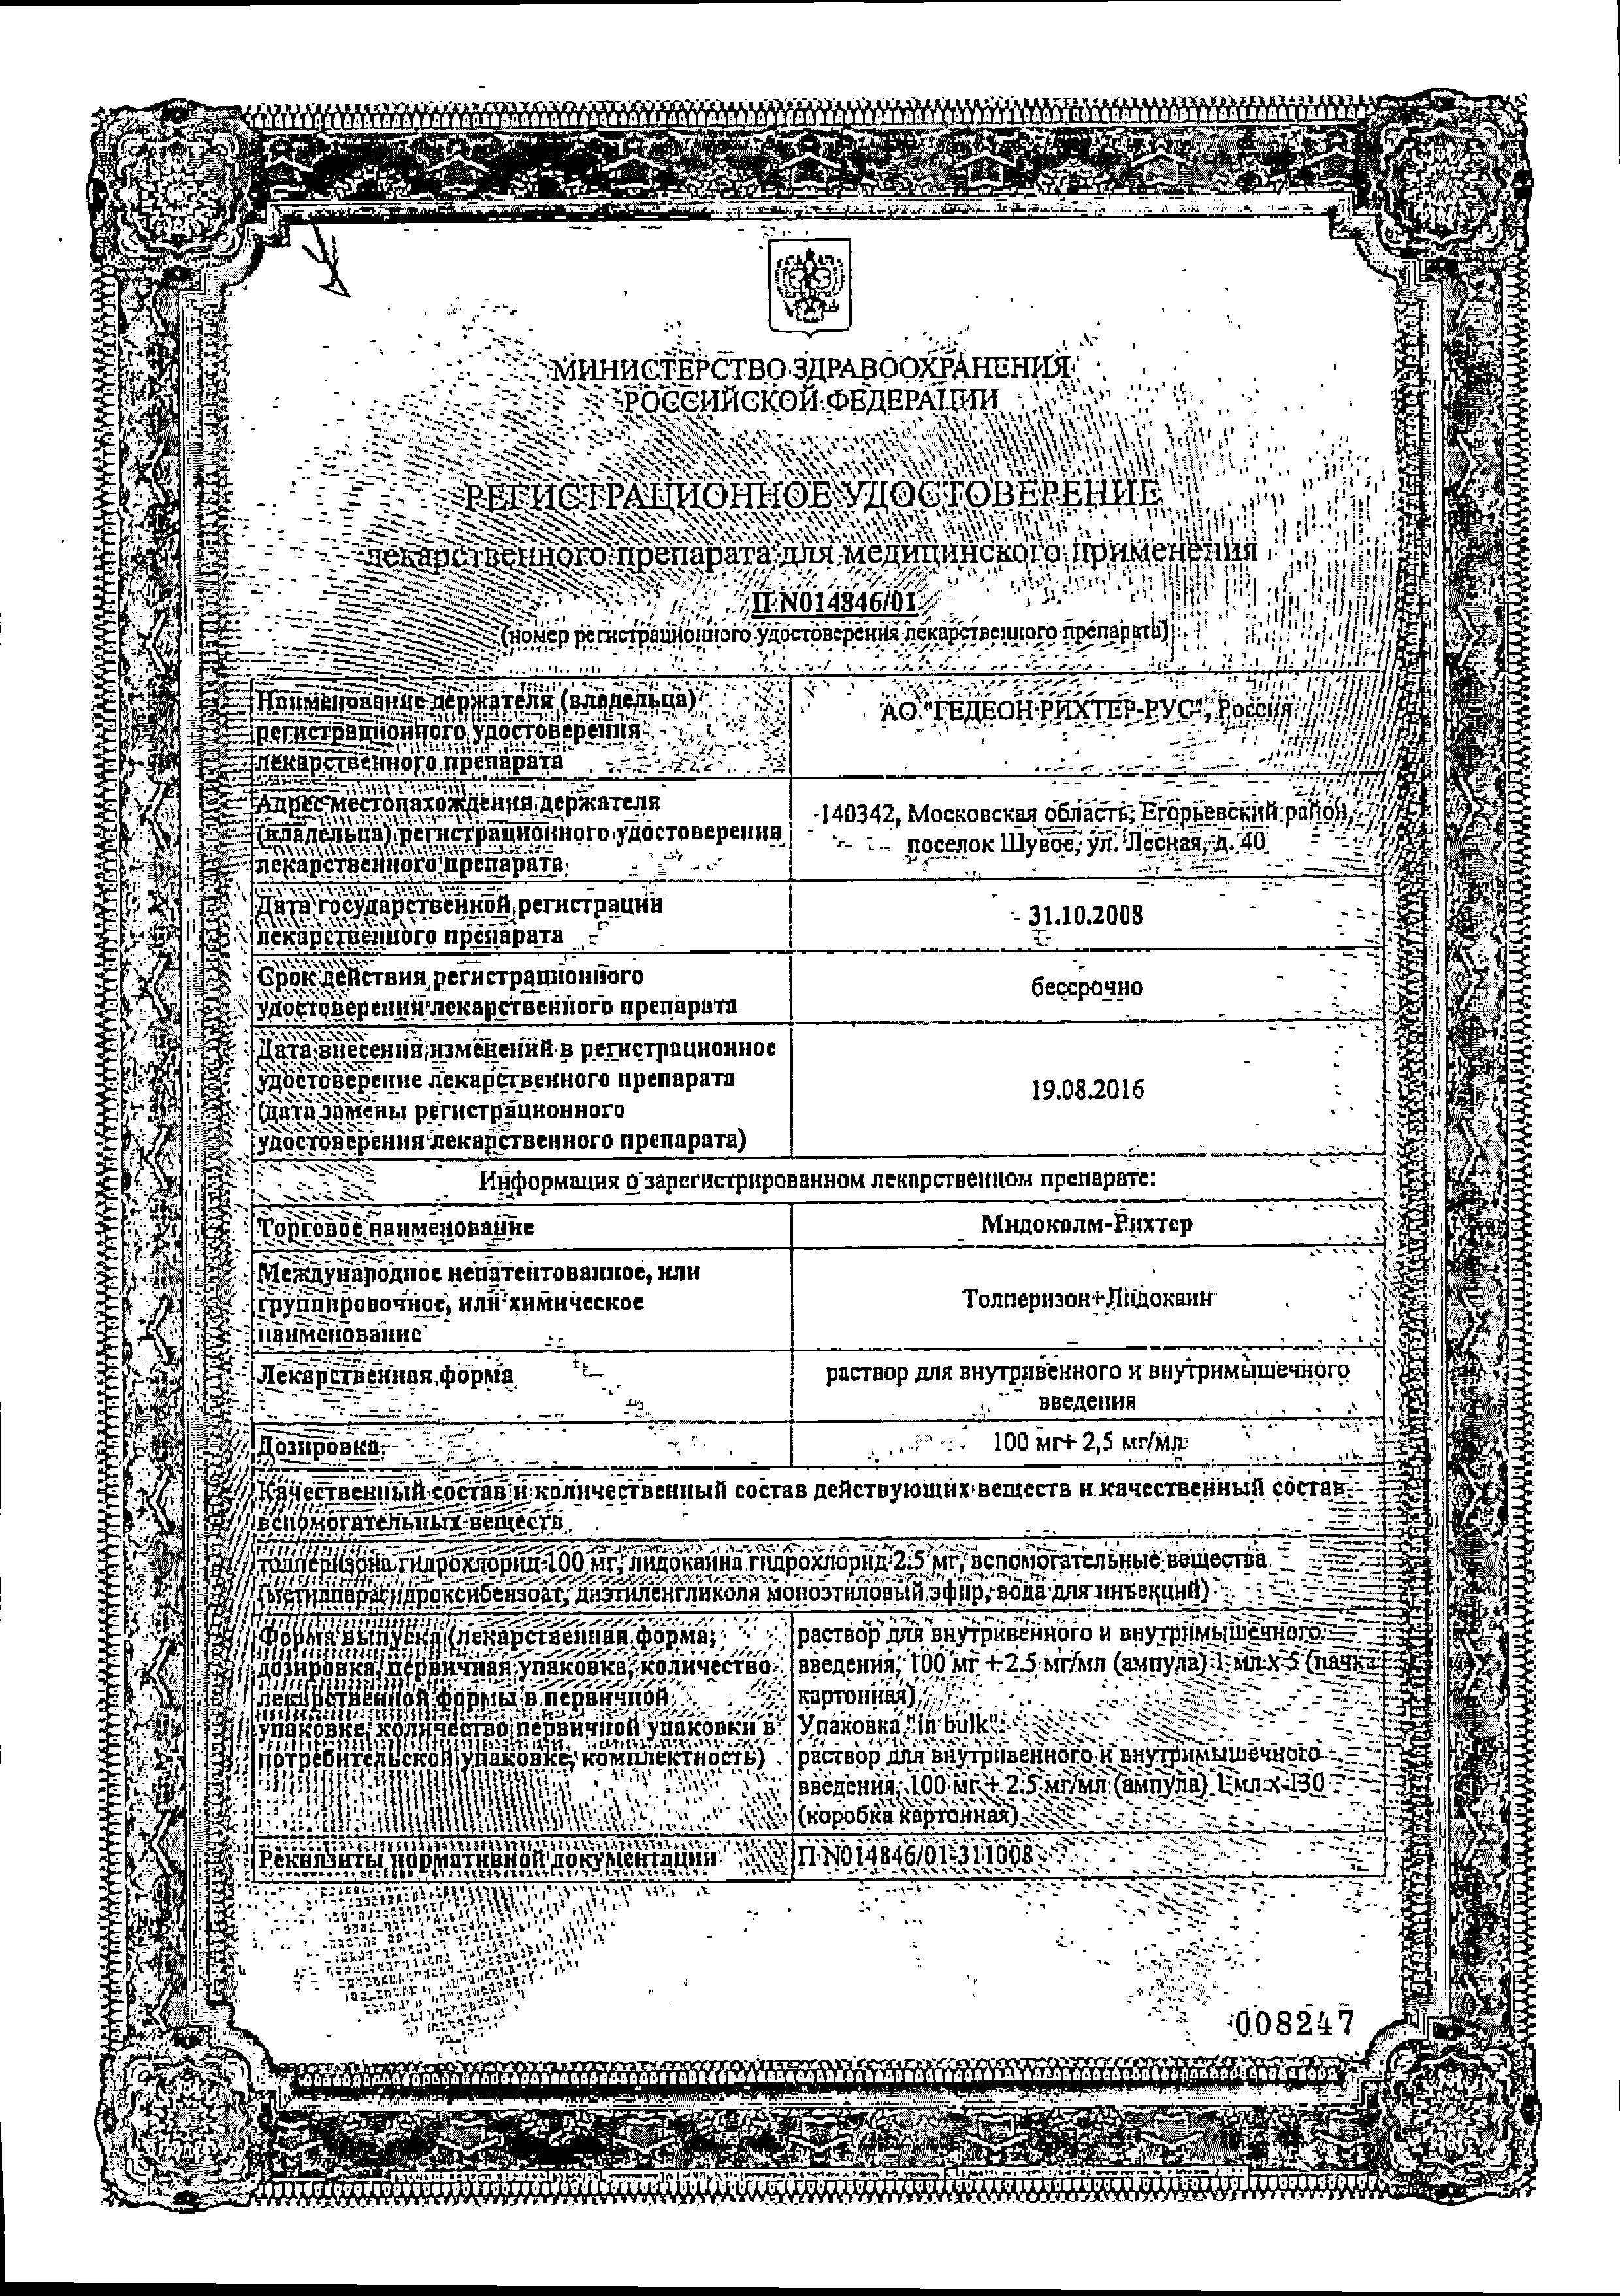 Мидокалм-Рихтер сертификат